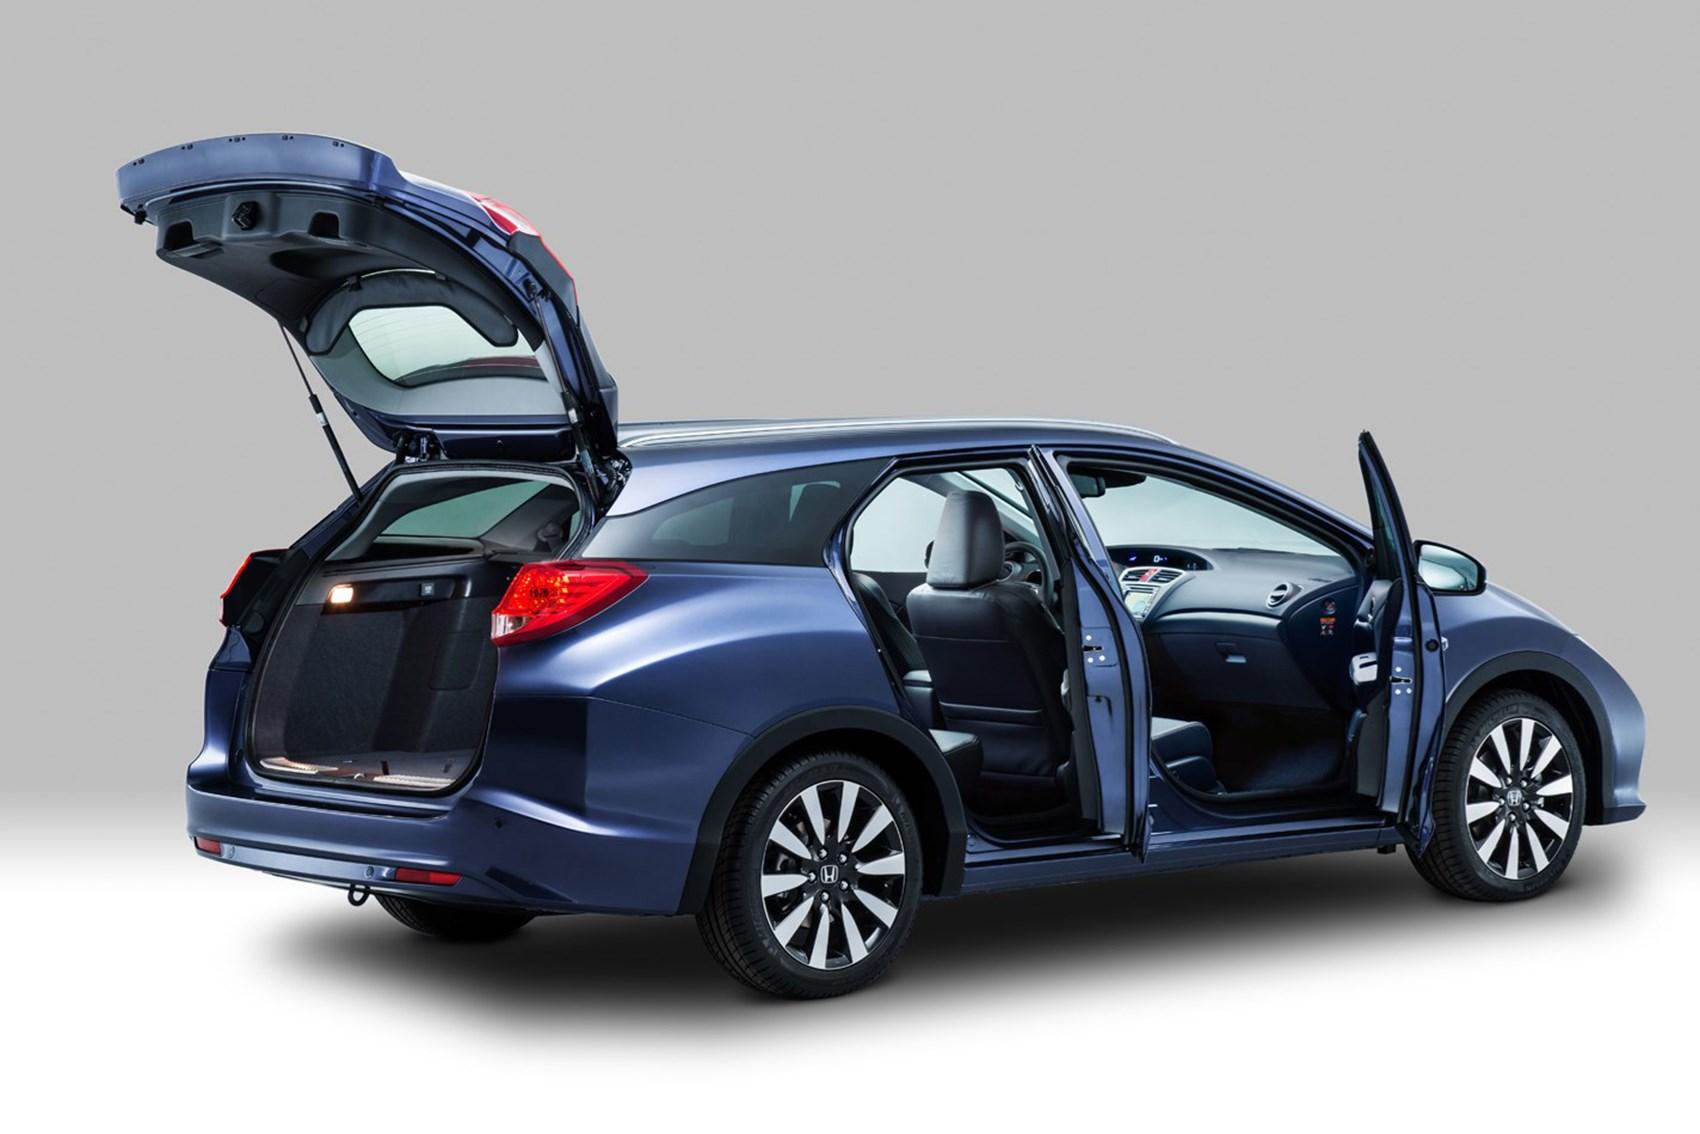 Honda Civic Tourer - Best small family estates